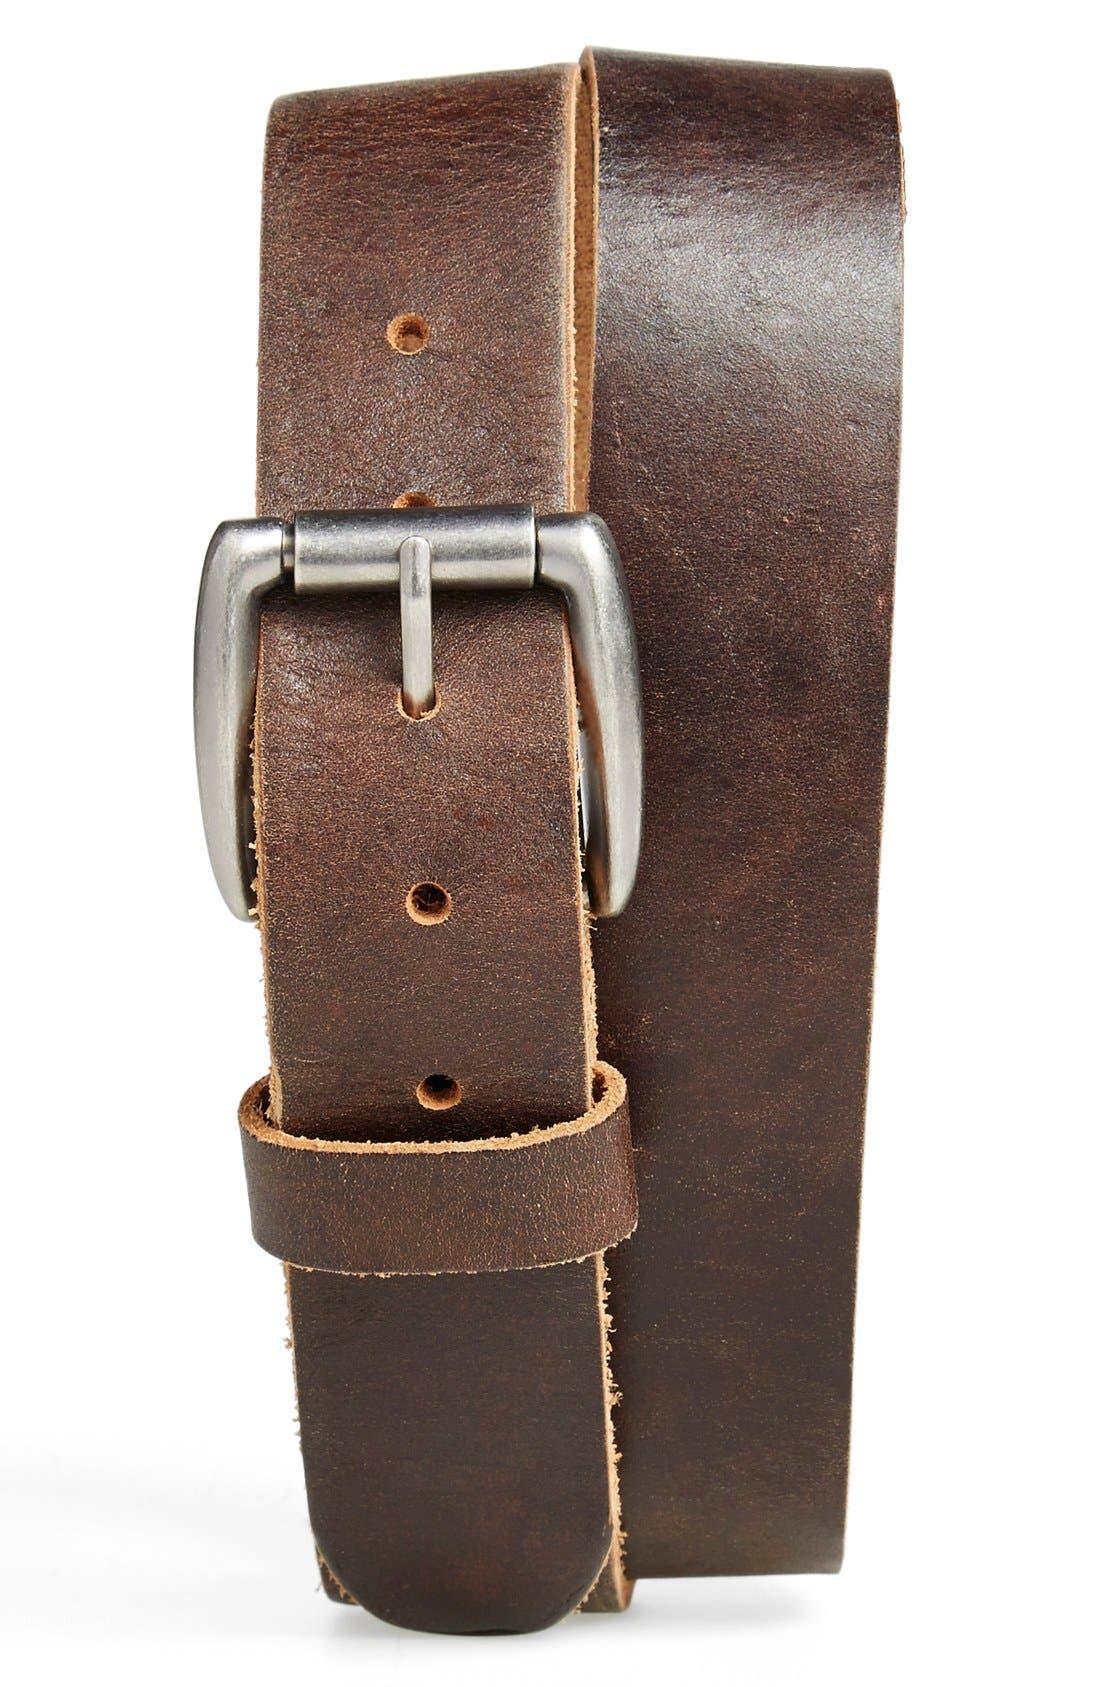 Alternate Image 1 Selected - Bill Adler 1981 Roller Buckle Belt